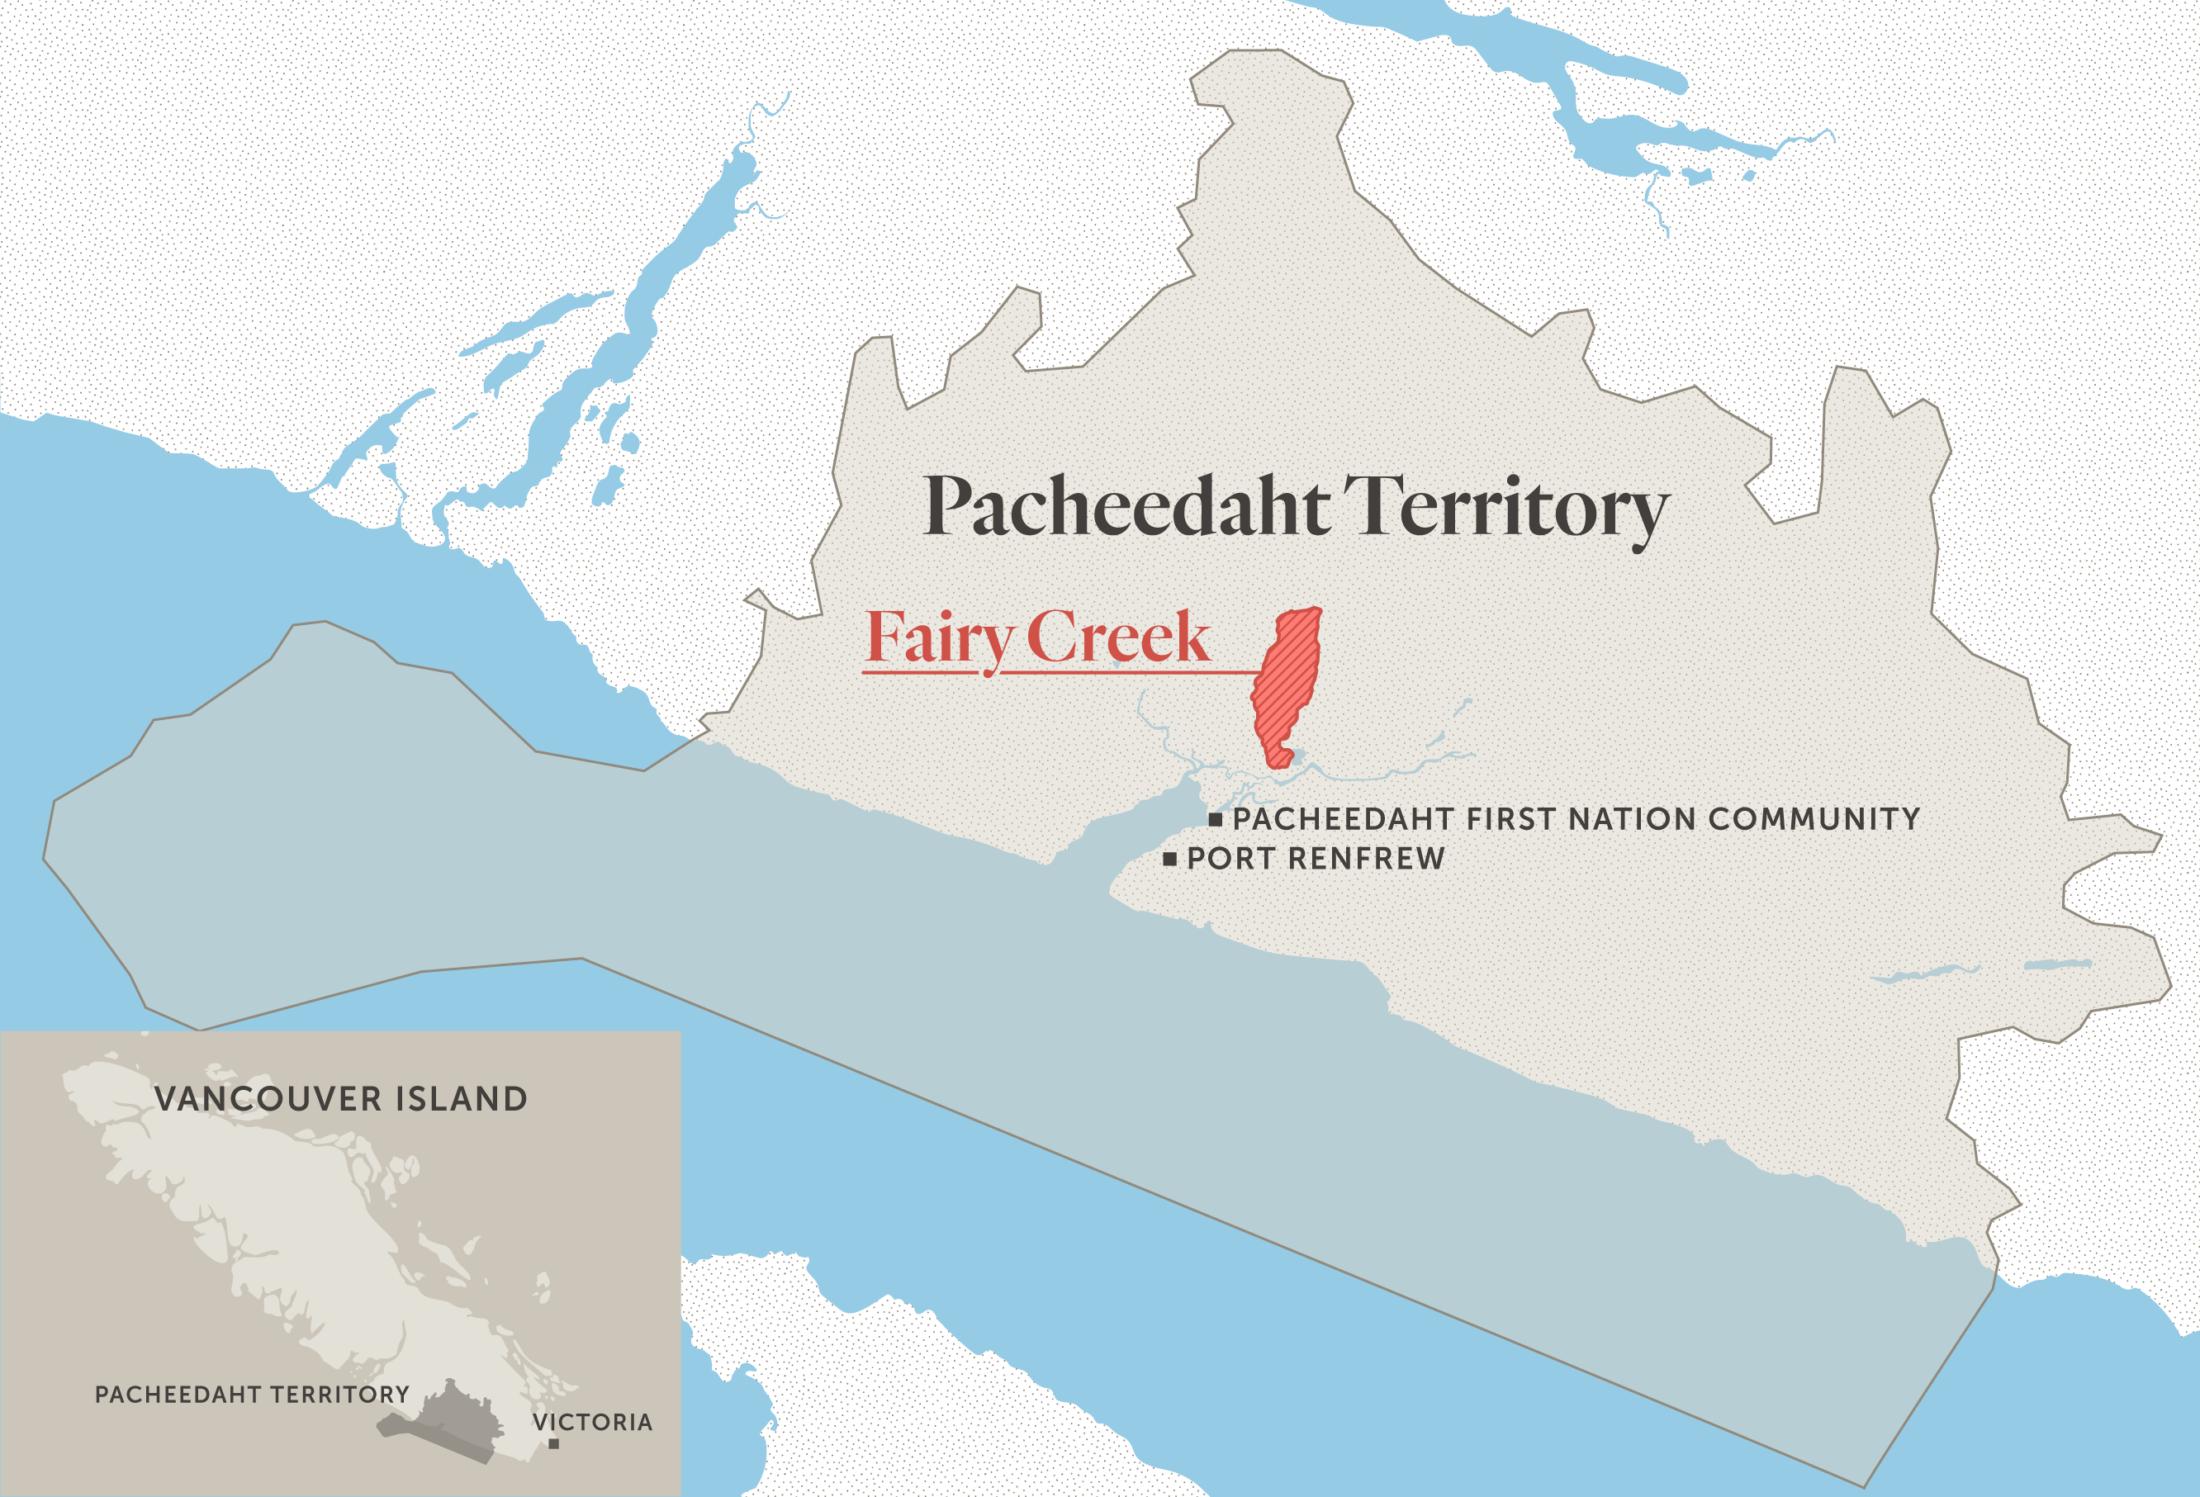 Map of Pacheedaht territory and Fairy Creek